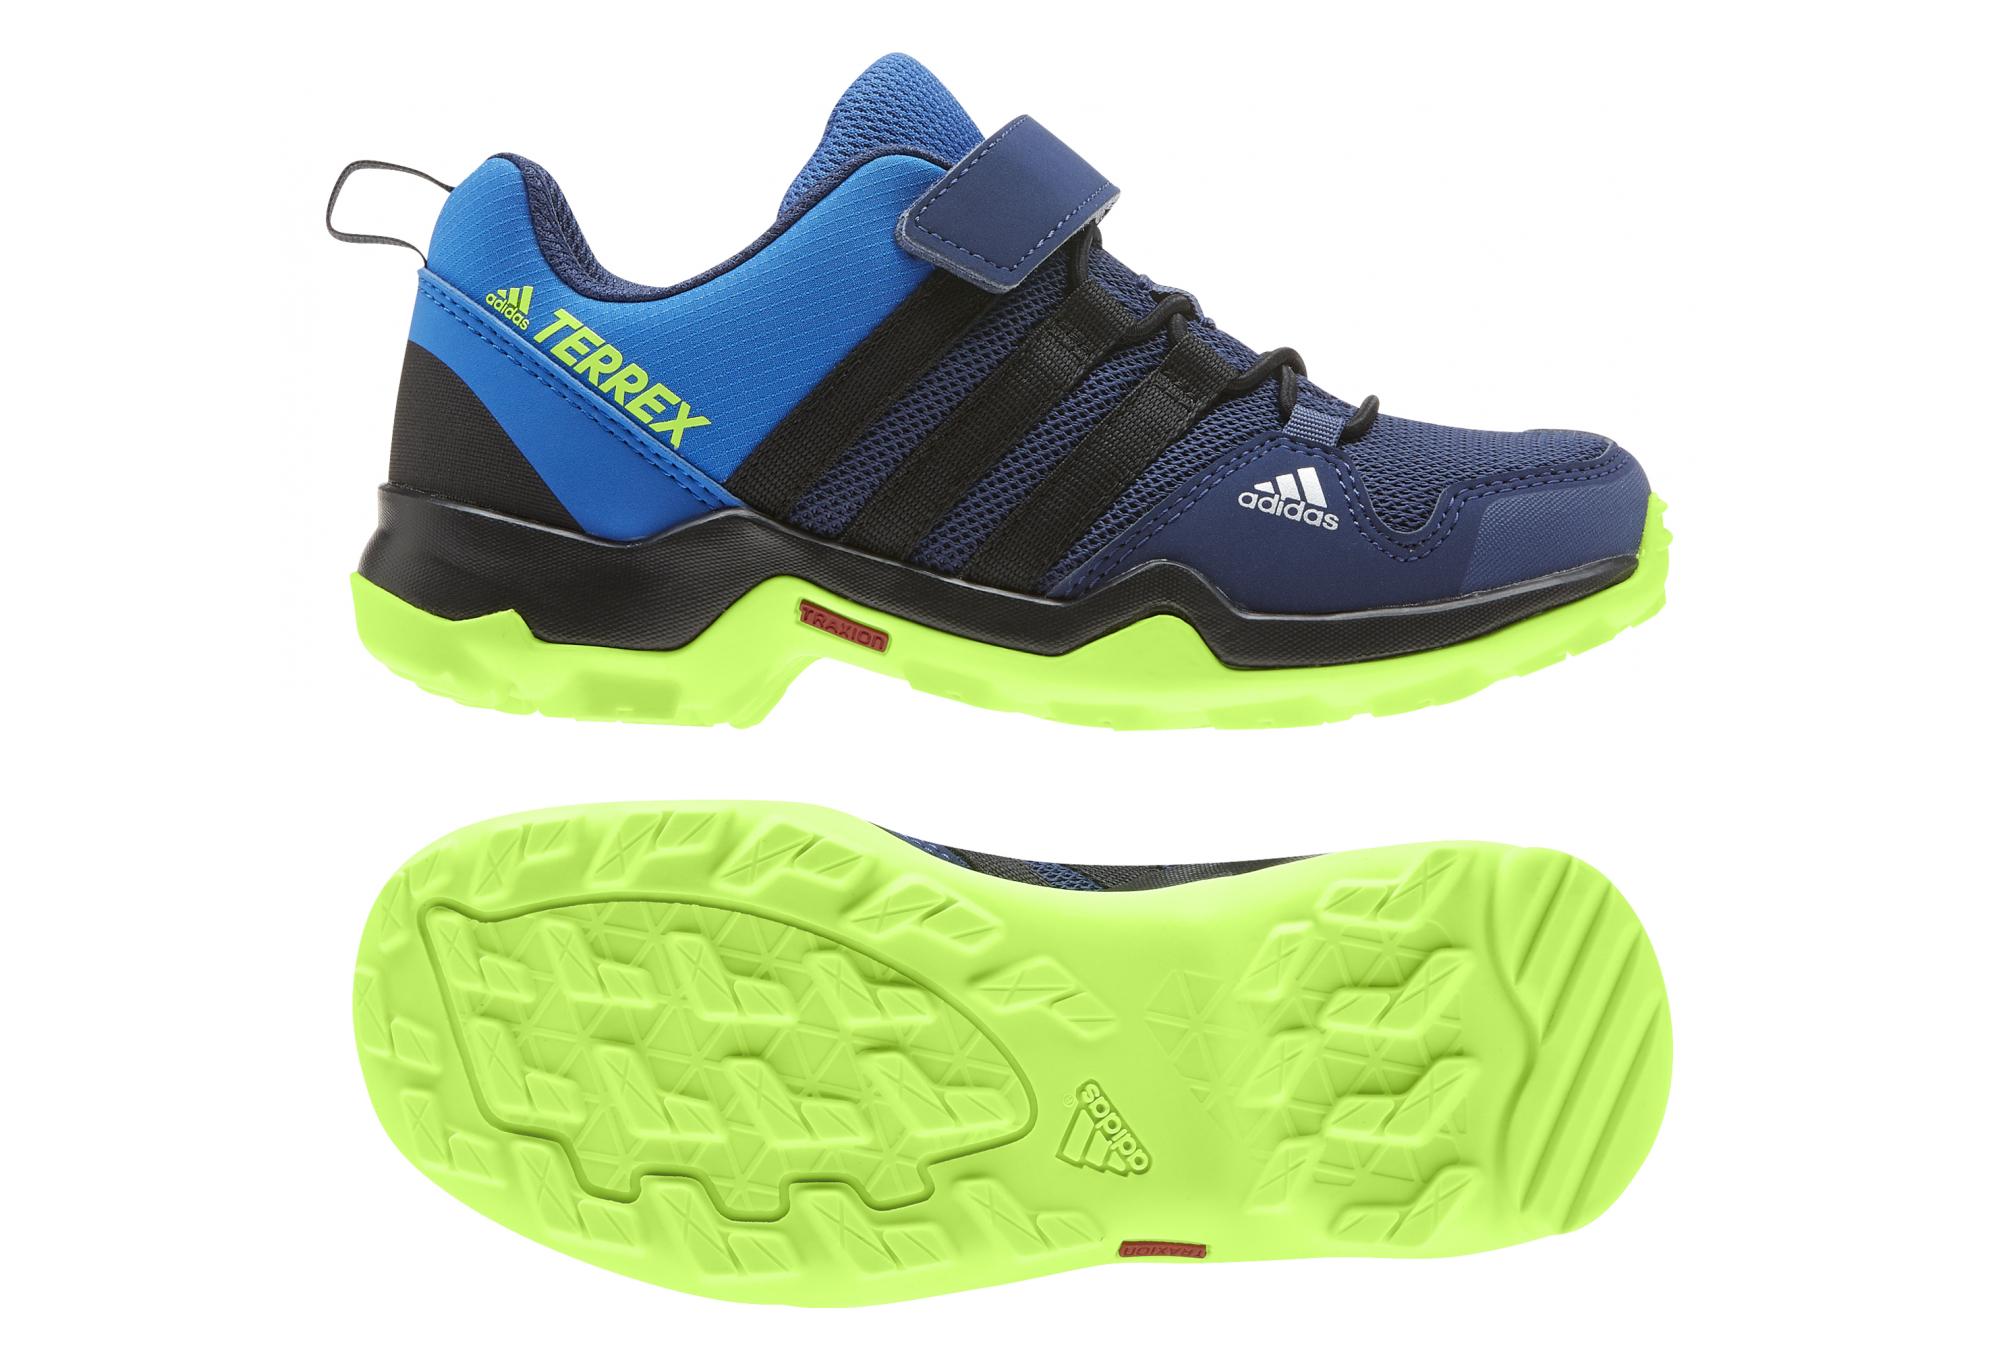 Chaussures junior adidas AX2R Comfort | Alltricks.com